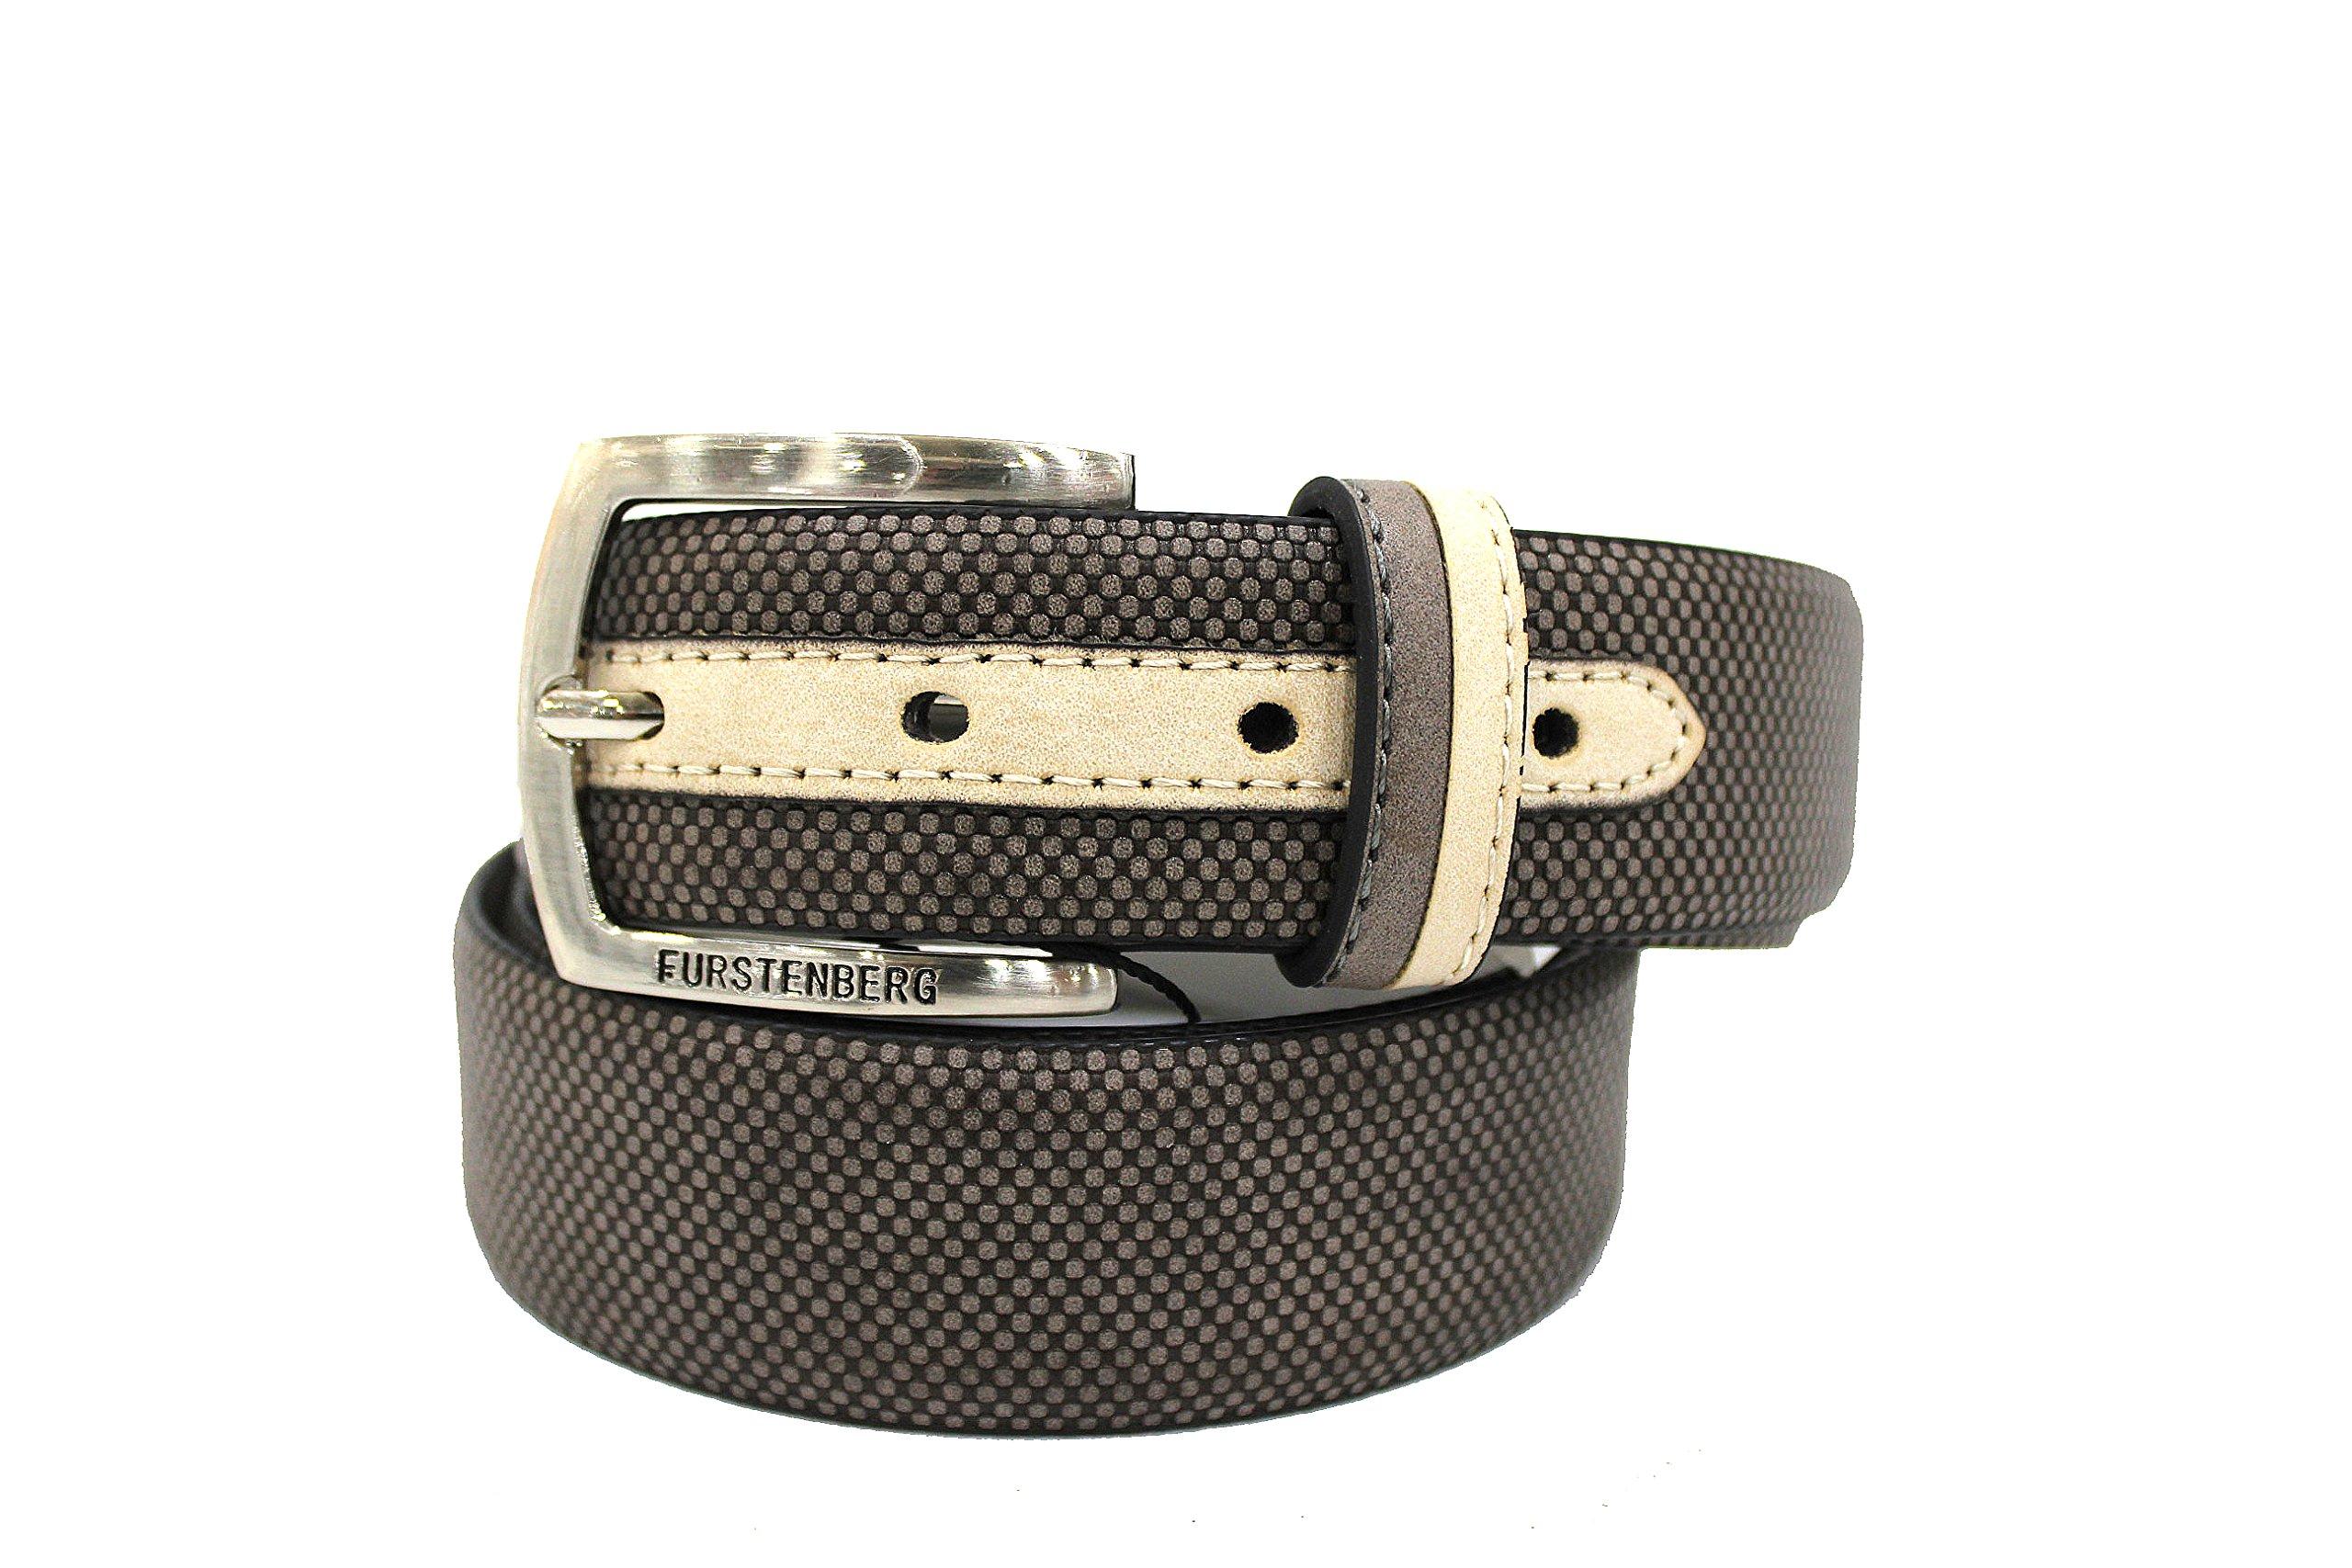 Cintura uomo Egon Von Furstenberg l.circle con portapenne 196-35 grigio